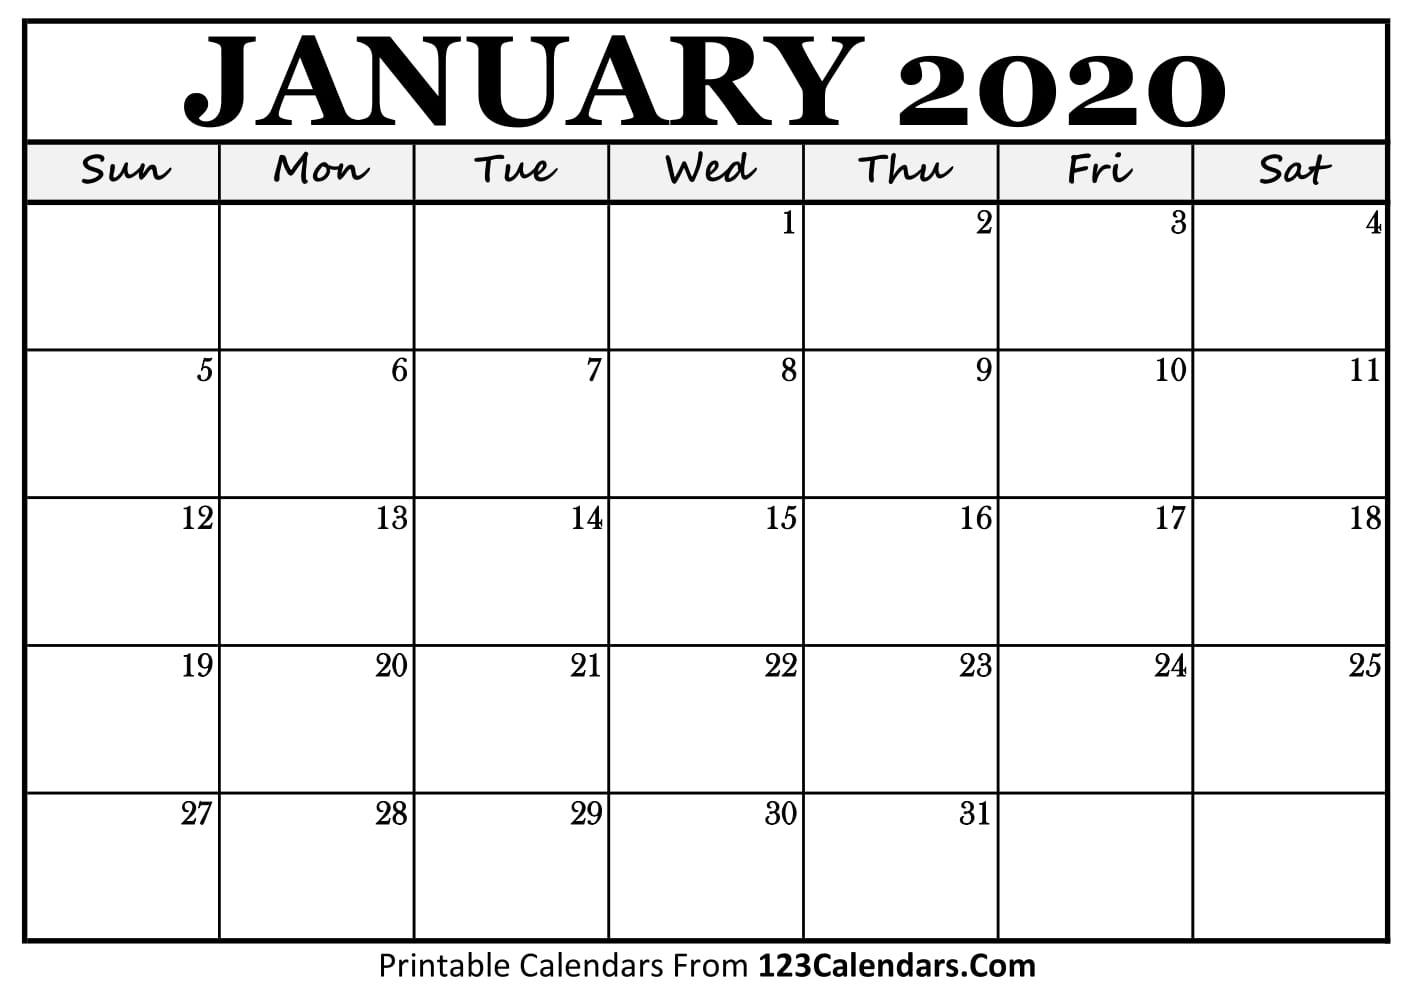 January 2020 Printable Calendar   123Calendars inside Printable Calendar For 2020 To Type On